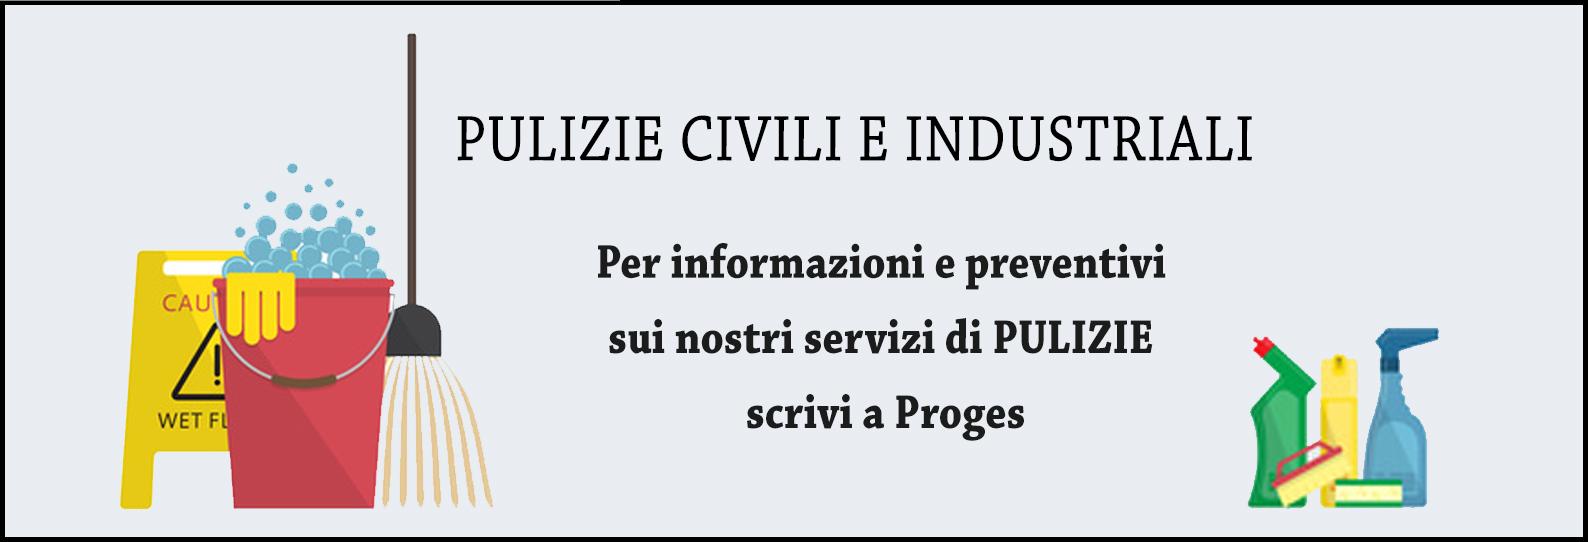 Proges_sito pll_banner_scrivipulizie_